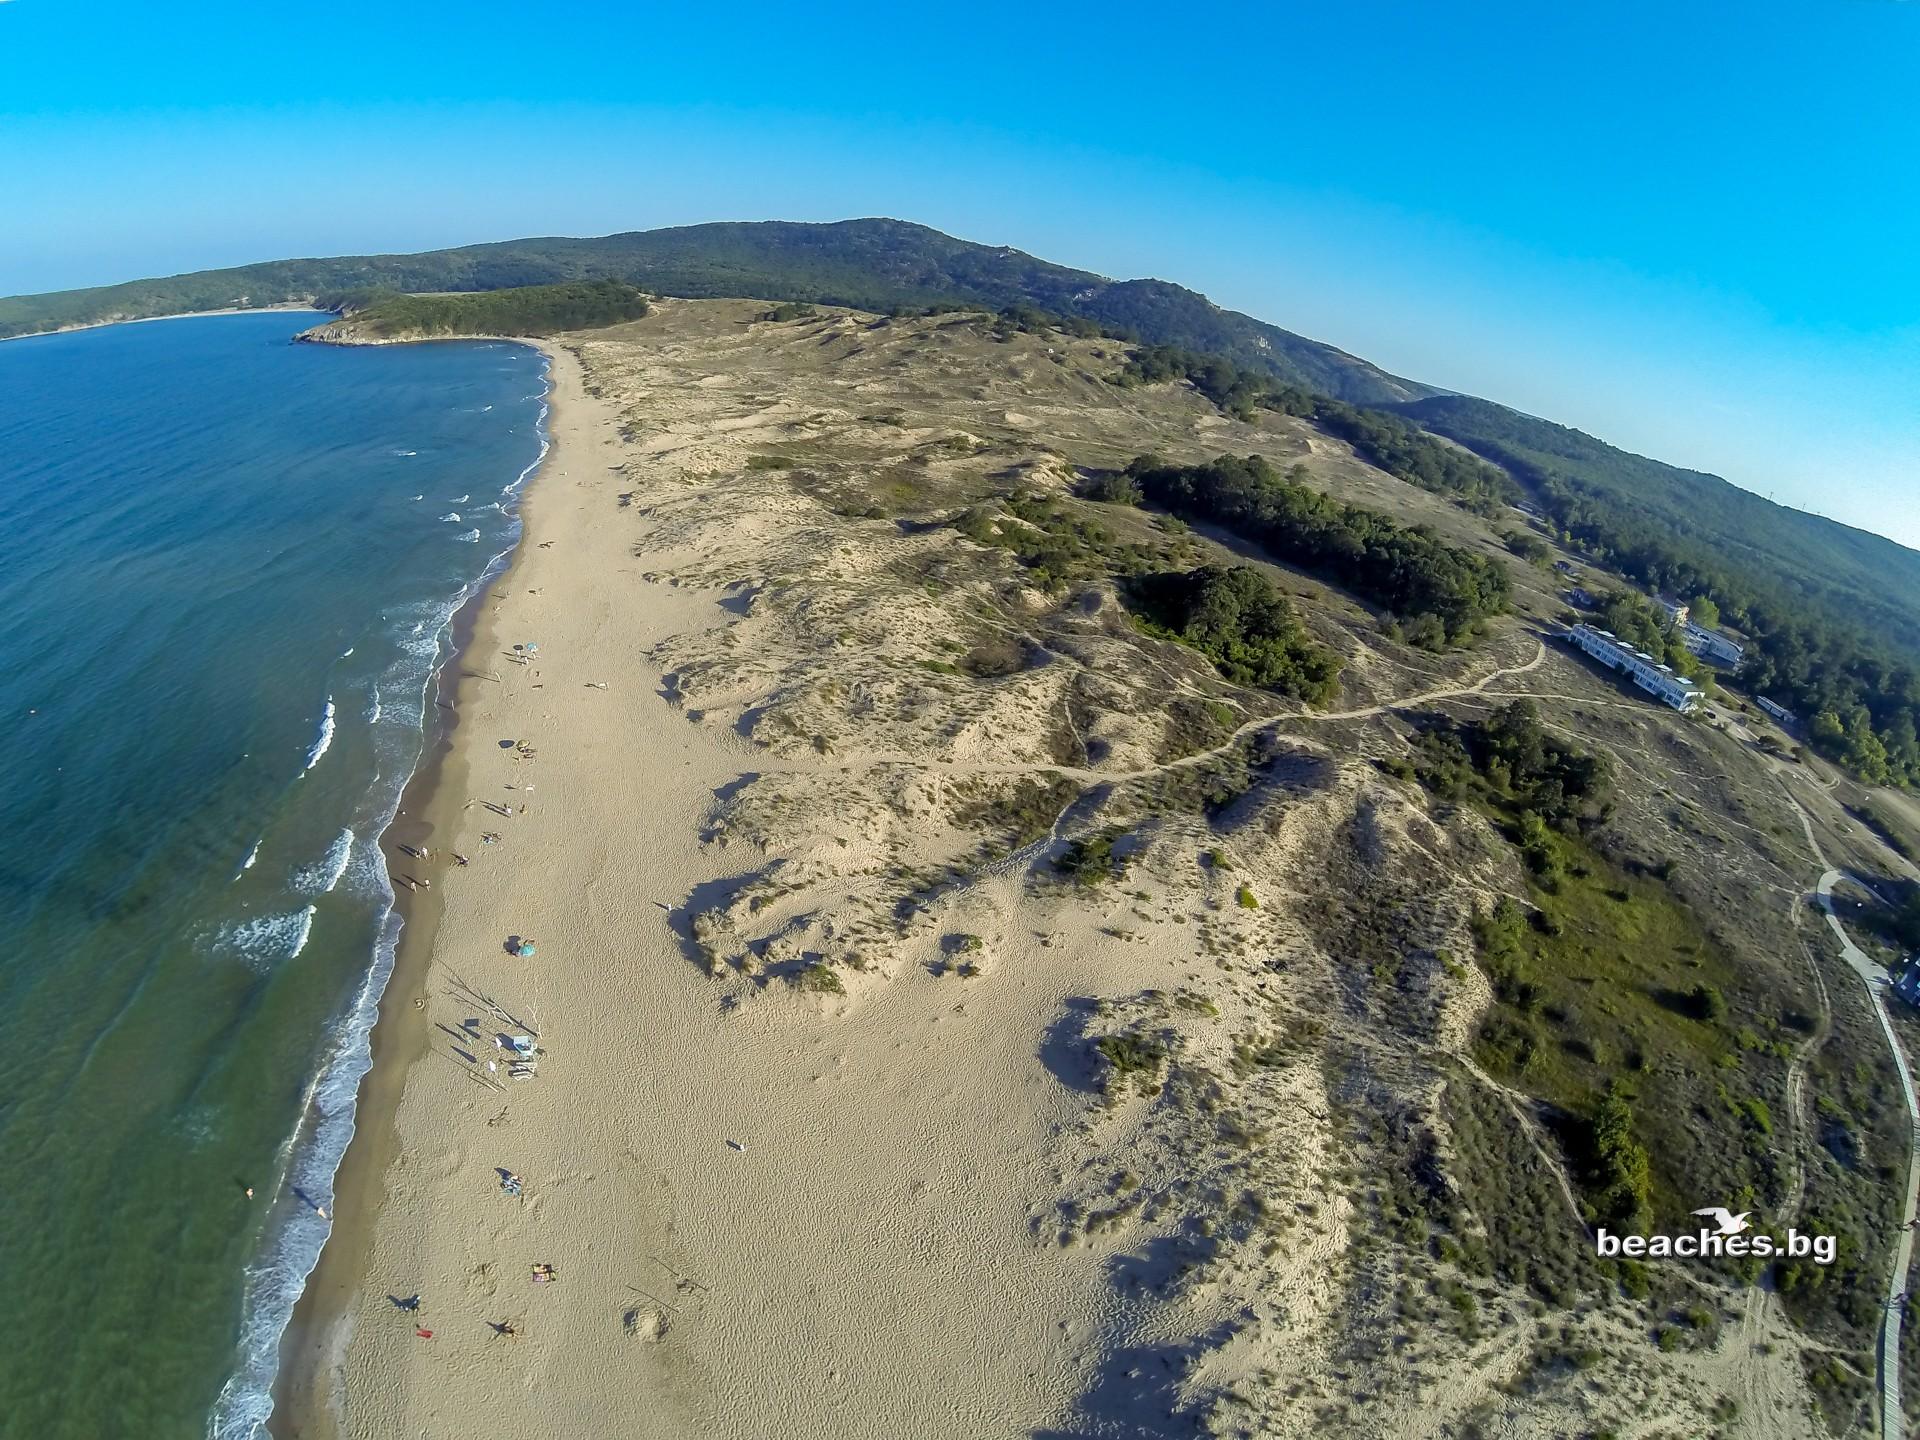 beaches.bg - Плаж Аркутино, България